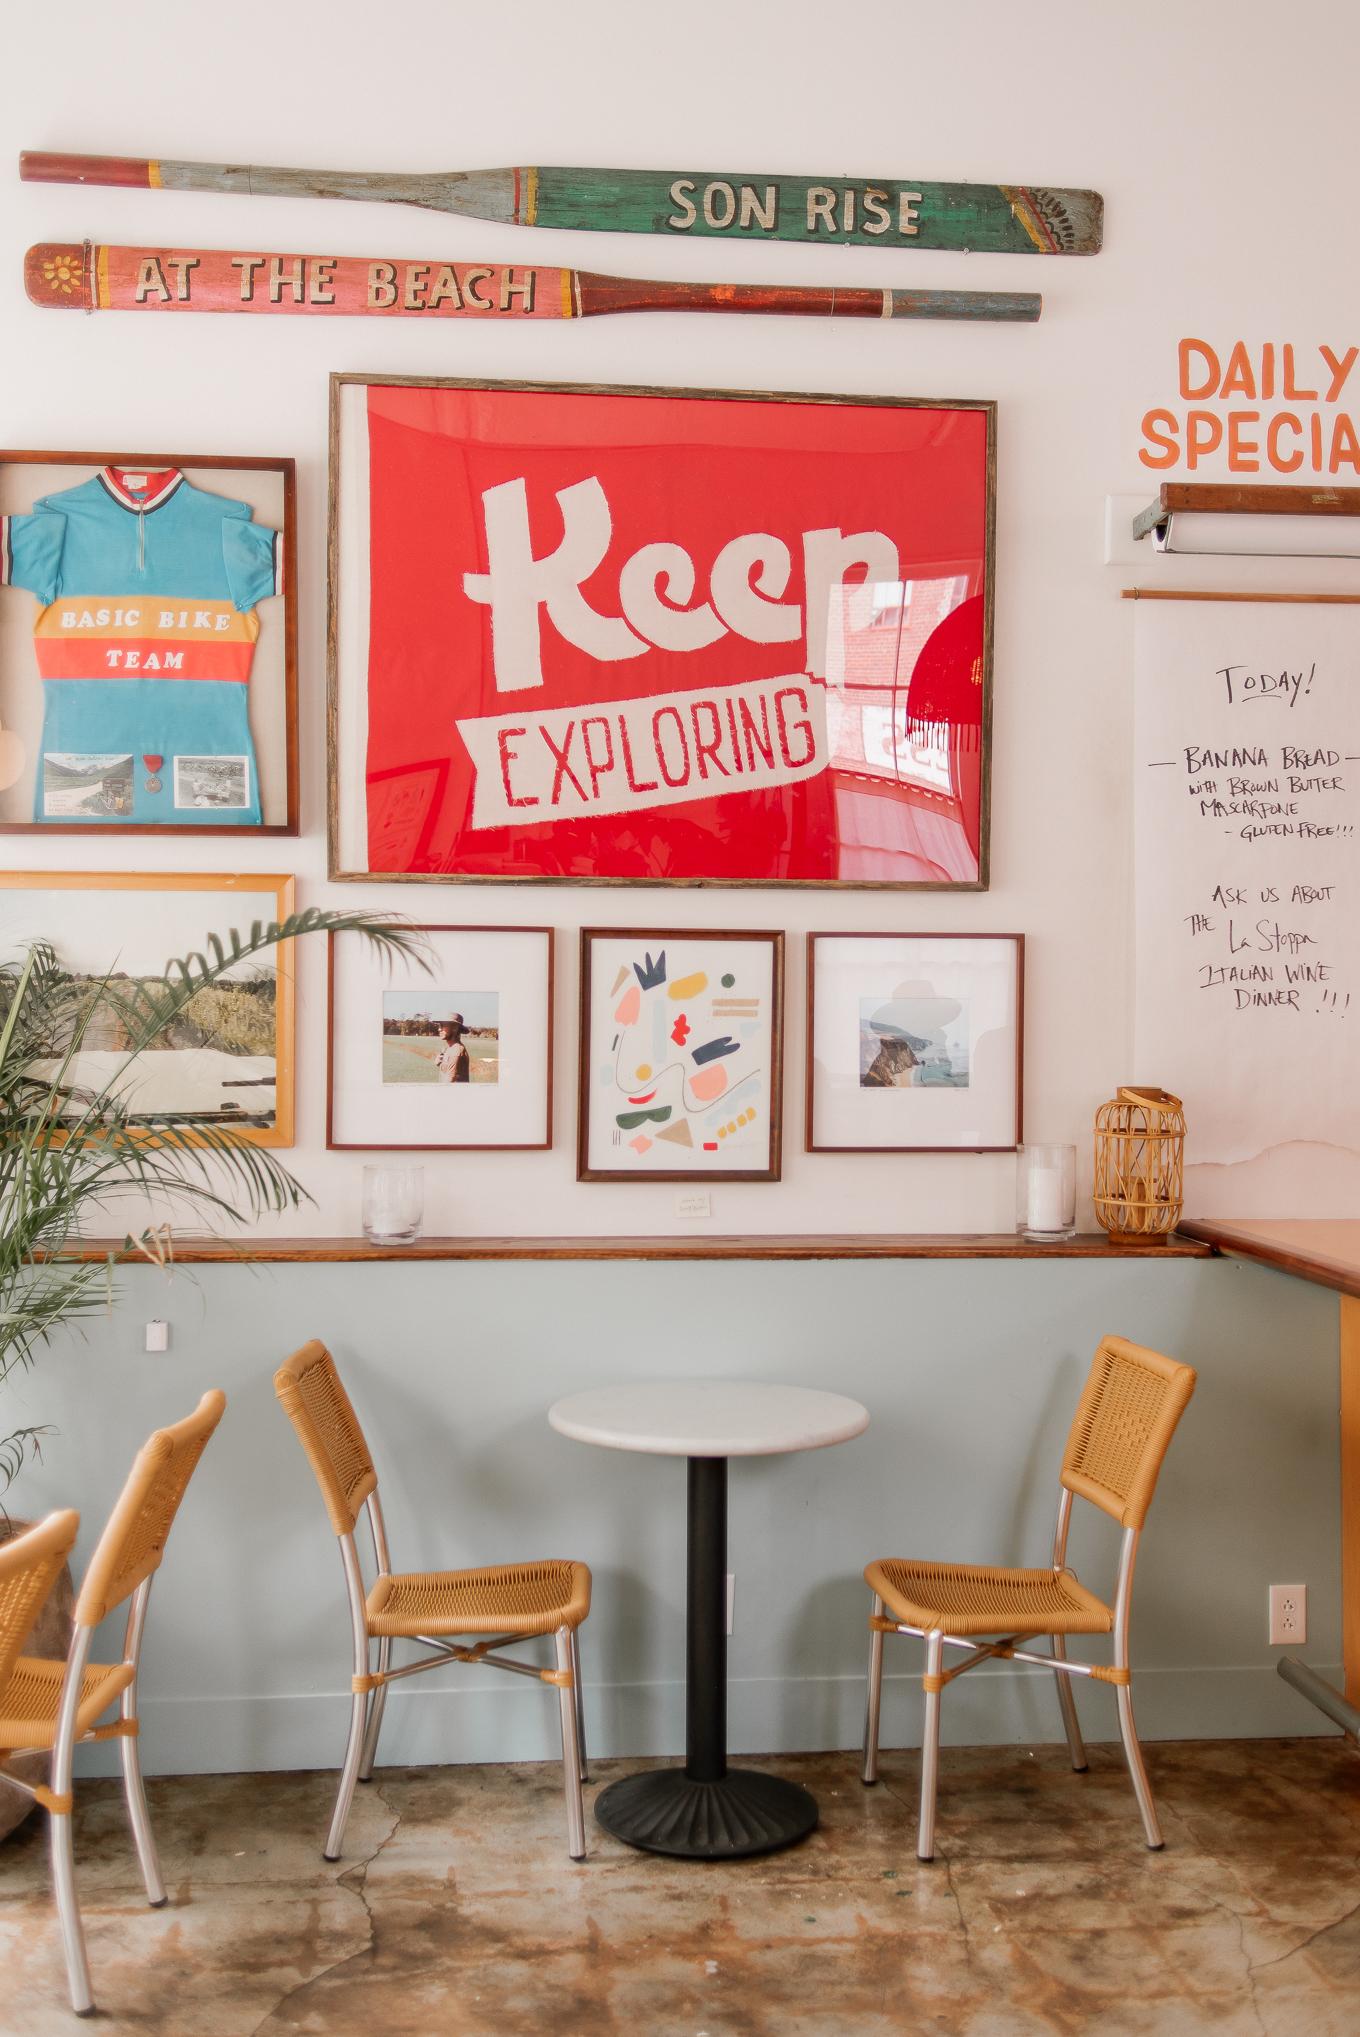 The Best Charleston Restaurants   Where to Eat in Charleston SC   Louella Reese